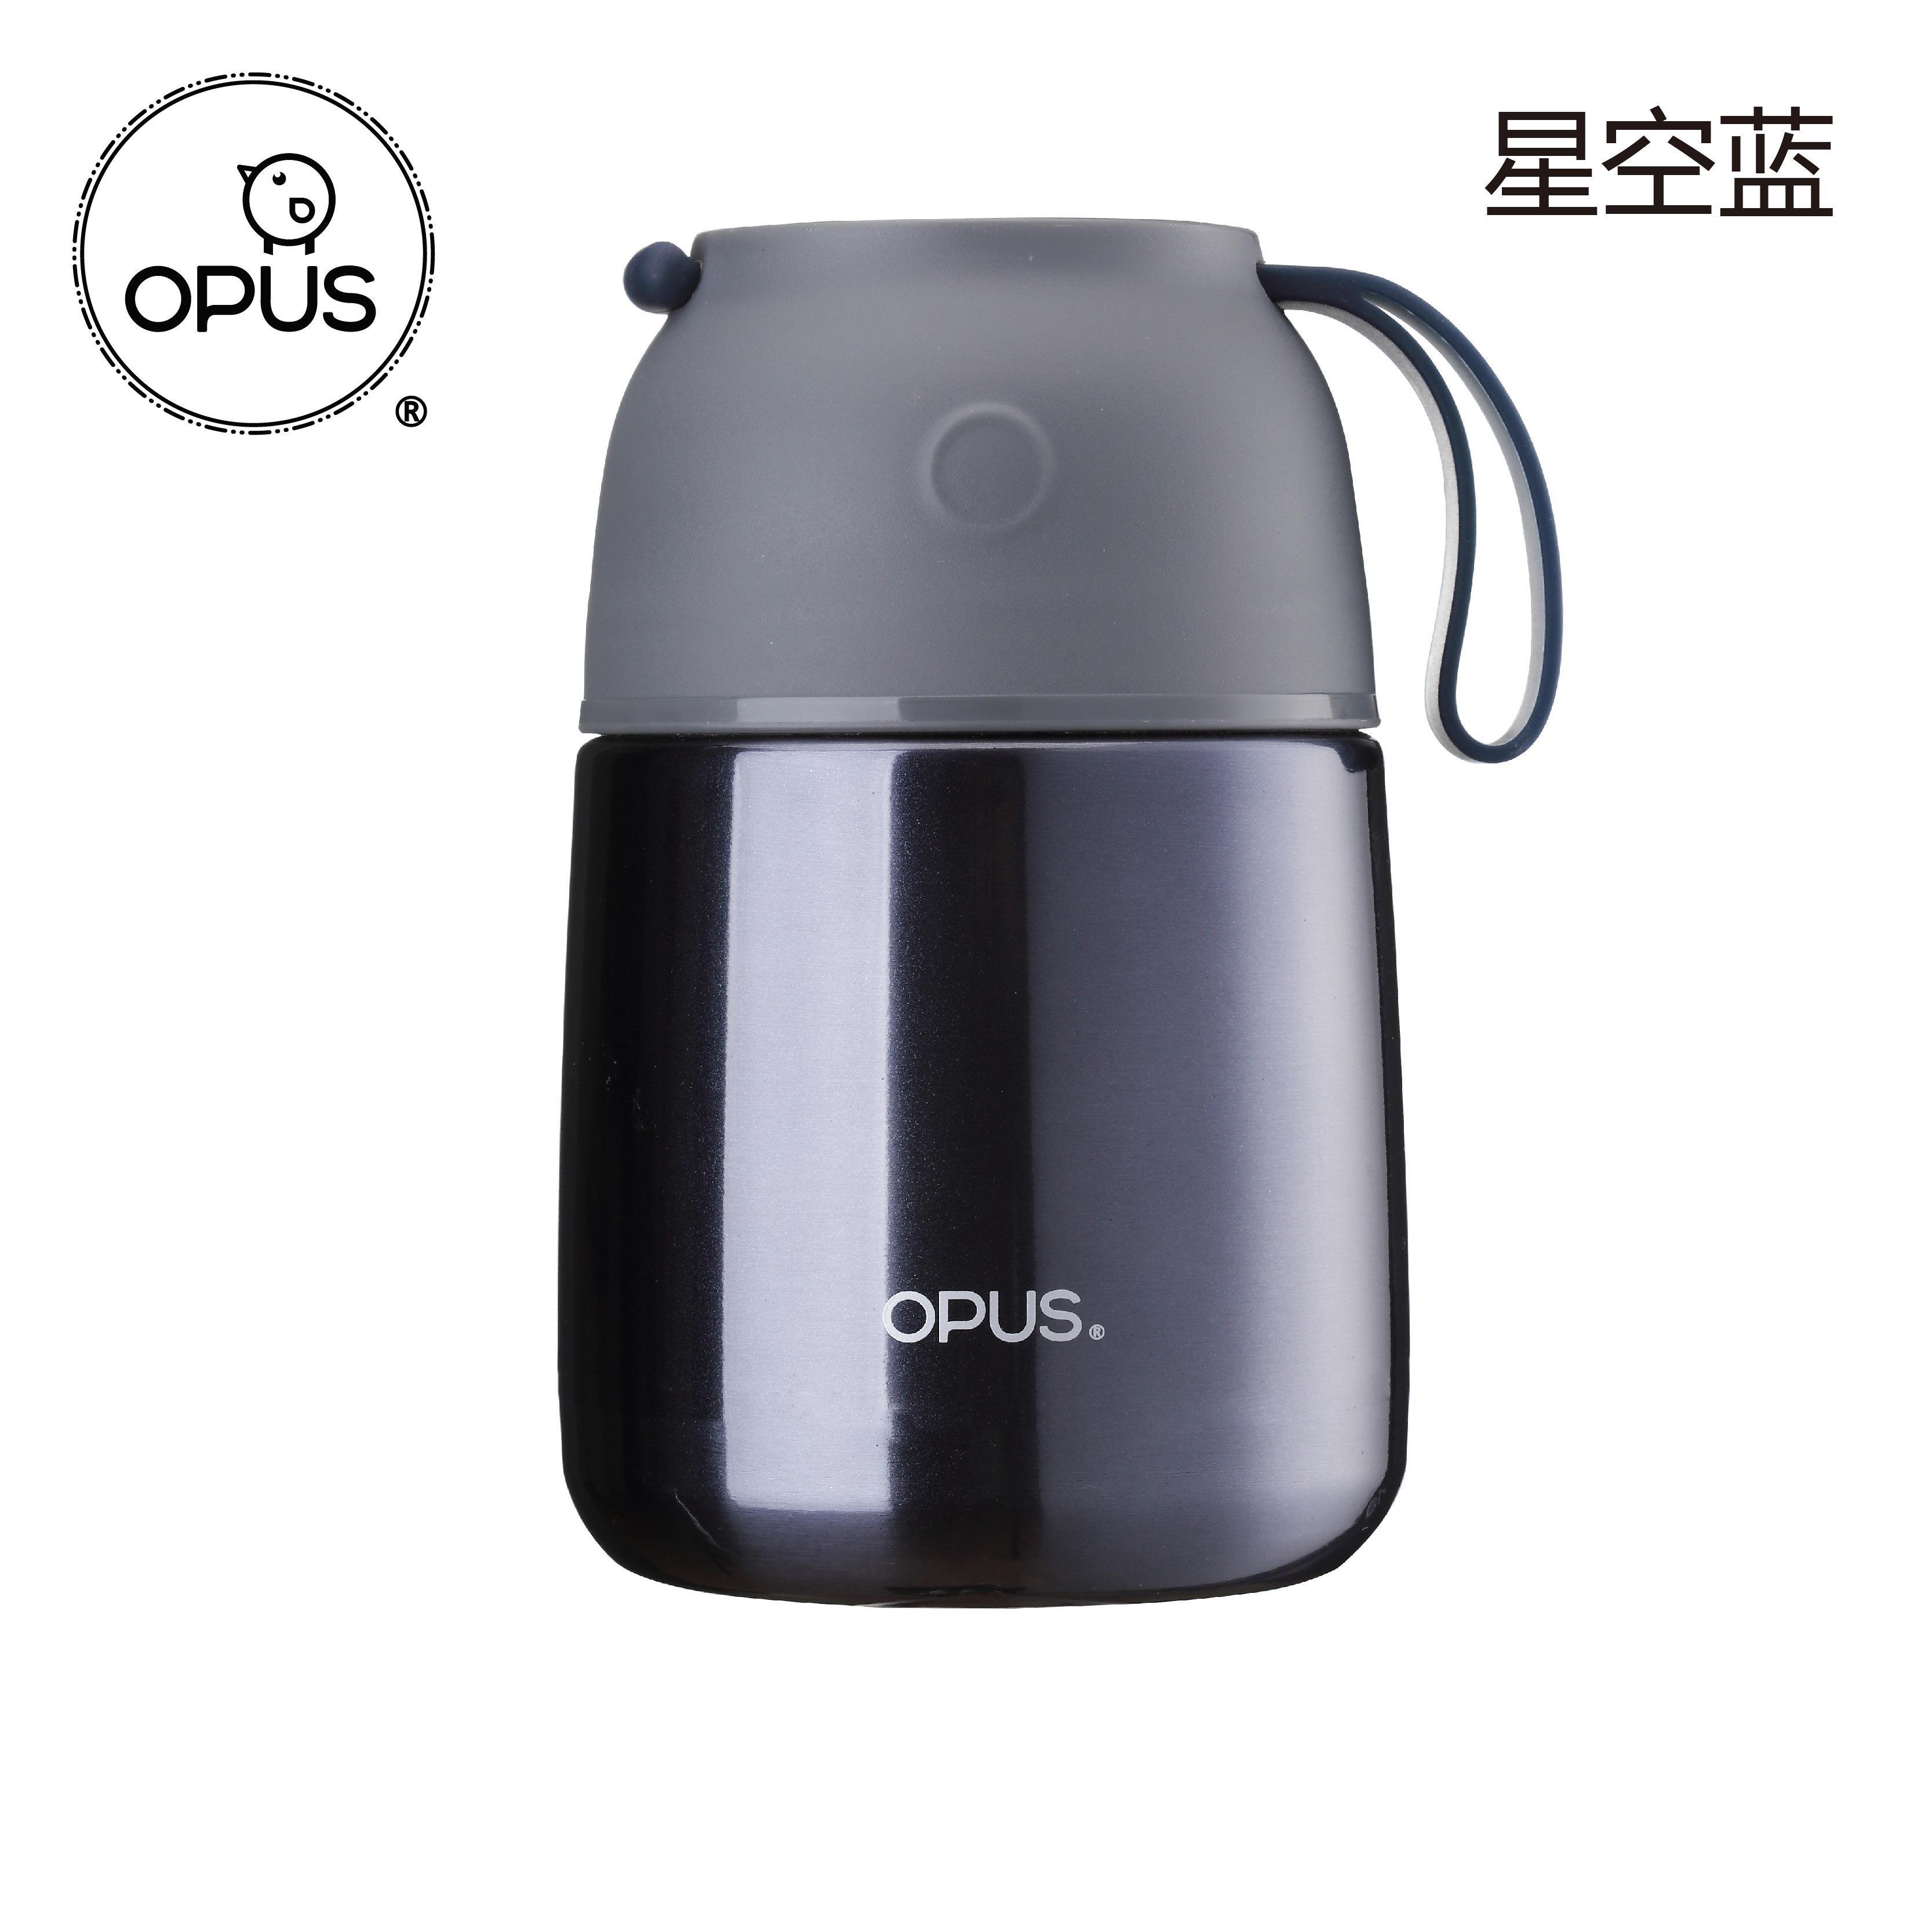 Best Offer Opus Stainless Steel Beaker Braised Beaker Stewing Pot